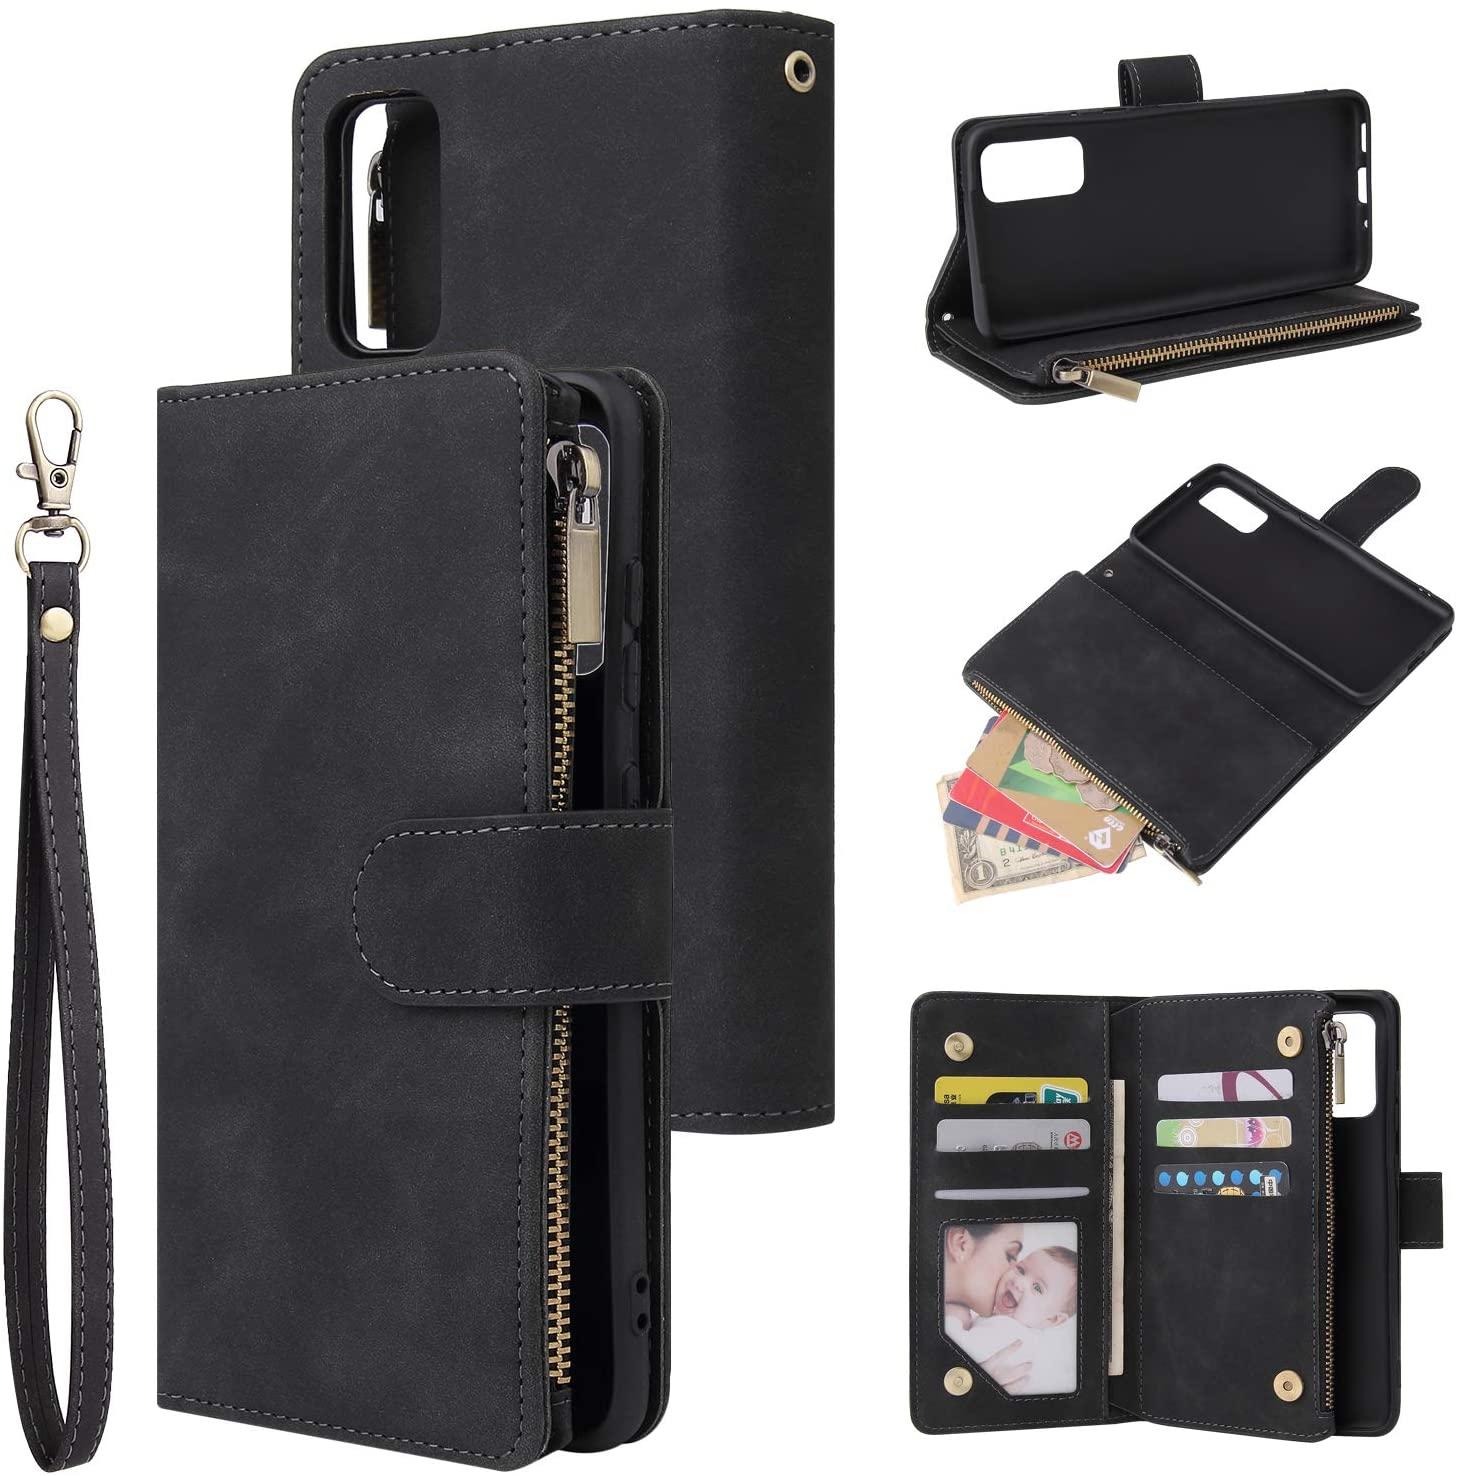 UEEBAI Wallet Case for Samsung Galaxy S20, Premium Vintage PU Leather Magnetic Closure Handbag Zipper Pocket Case Kickstand Card Holder Slots with Wrist Strap TPU Shockproof Flip Cover - Black